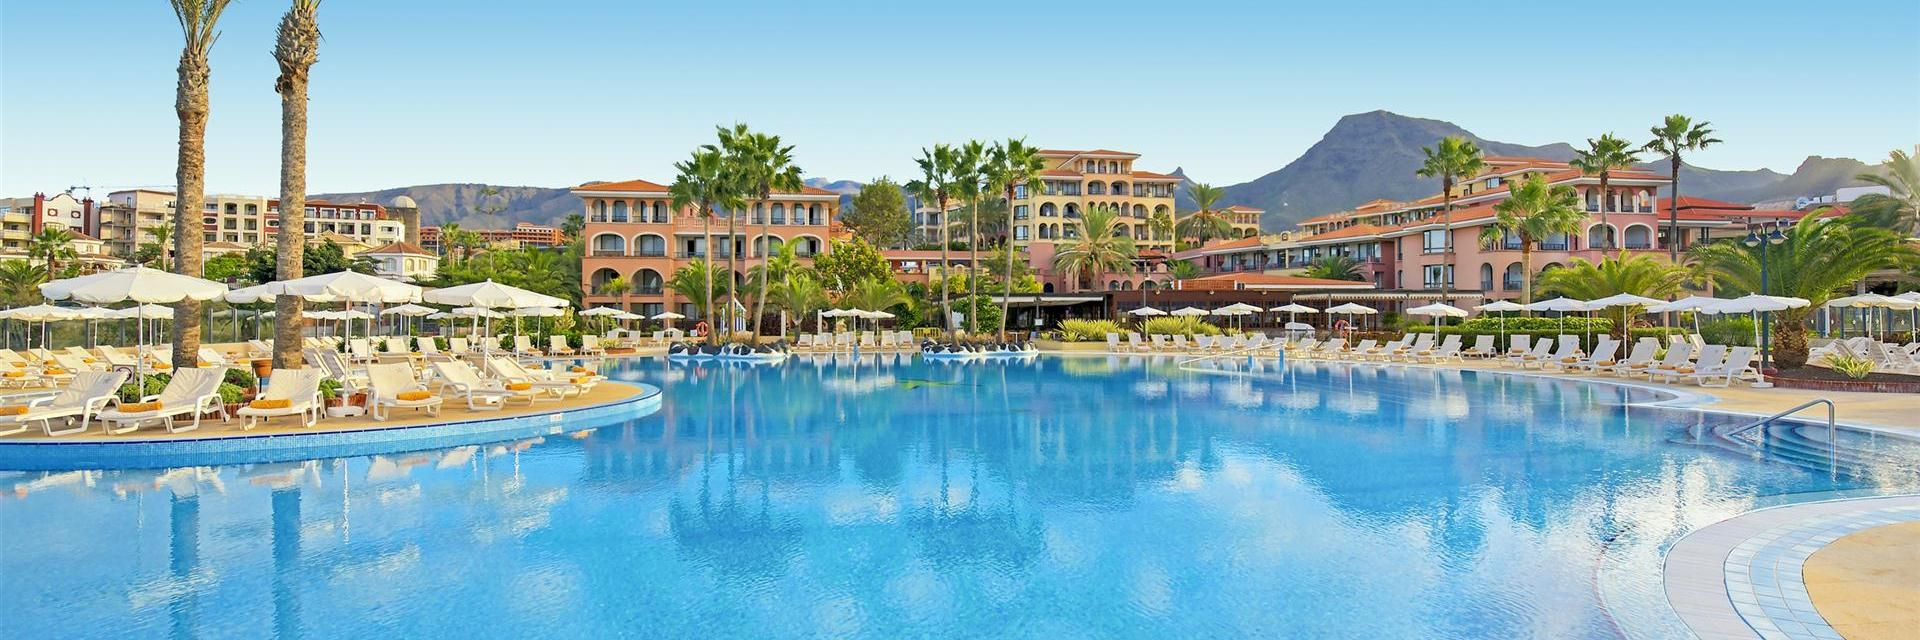 Costa Travel Agent Rates